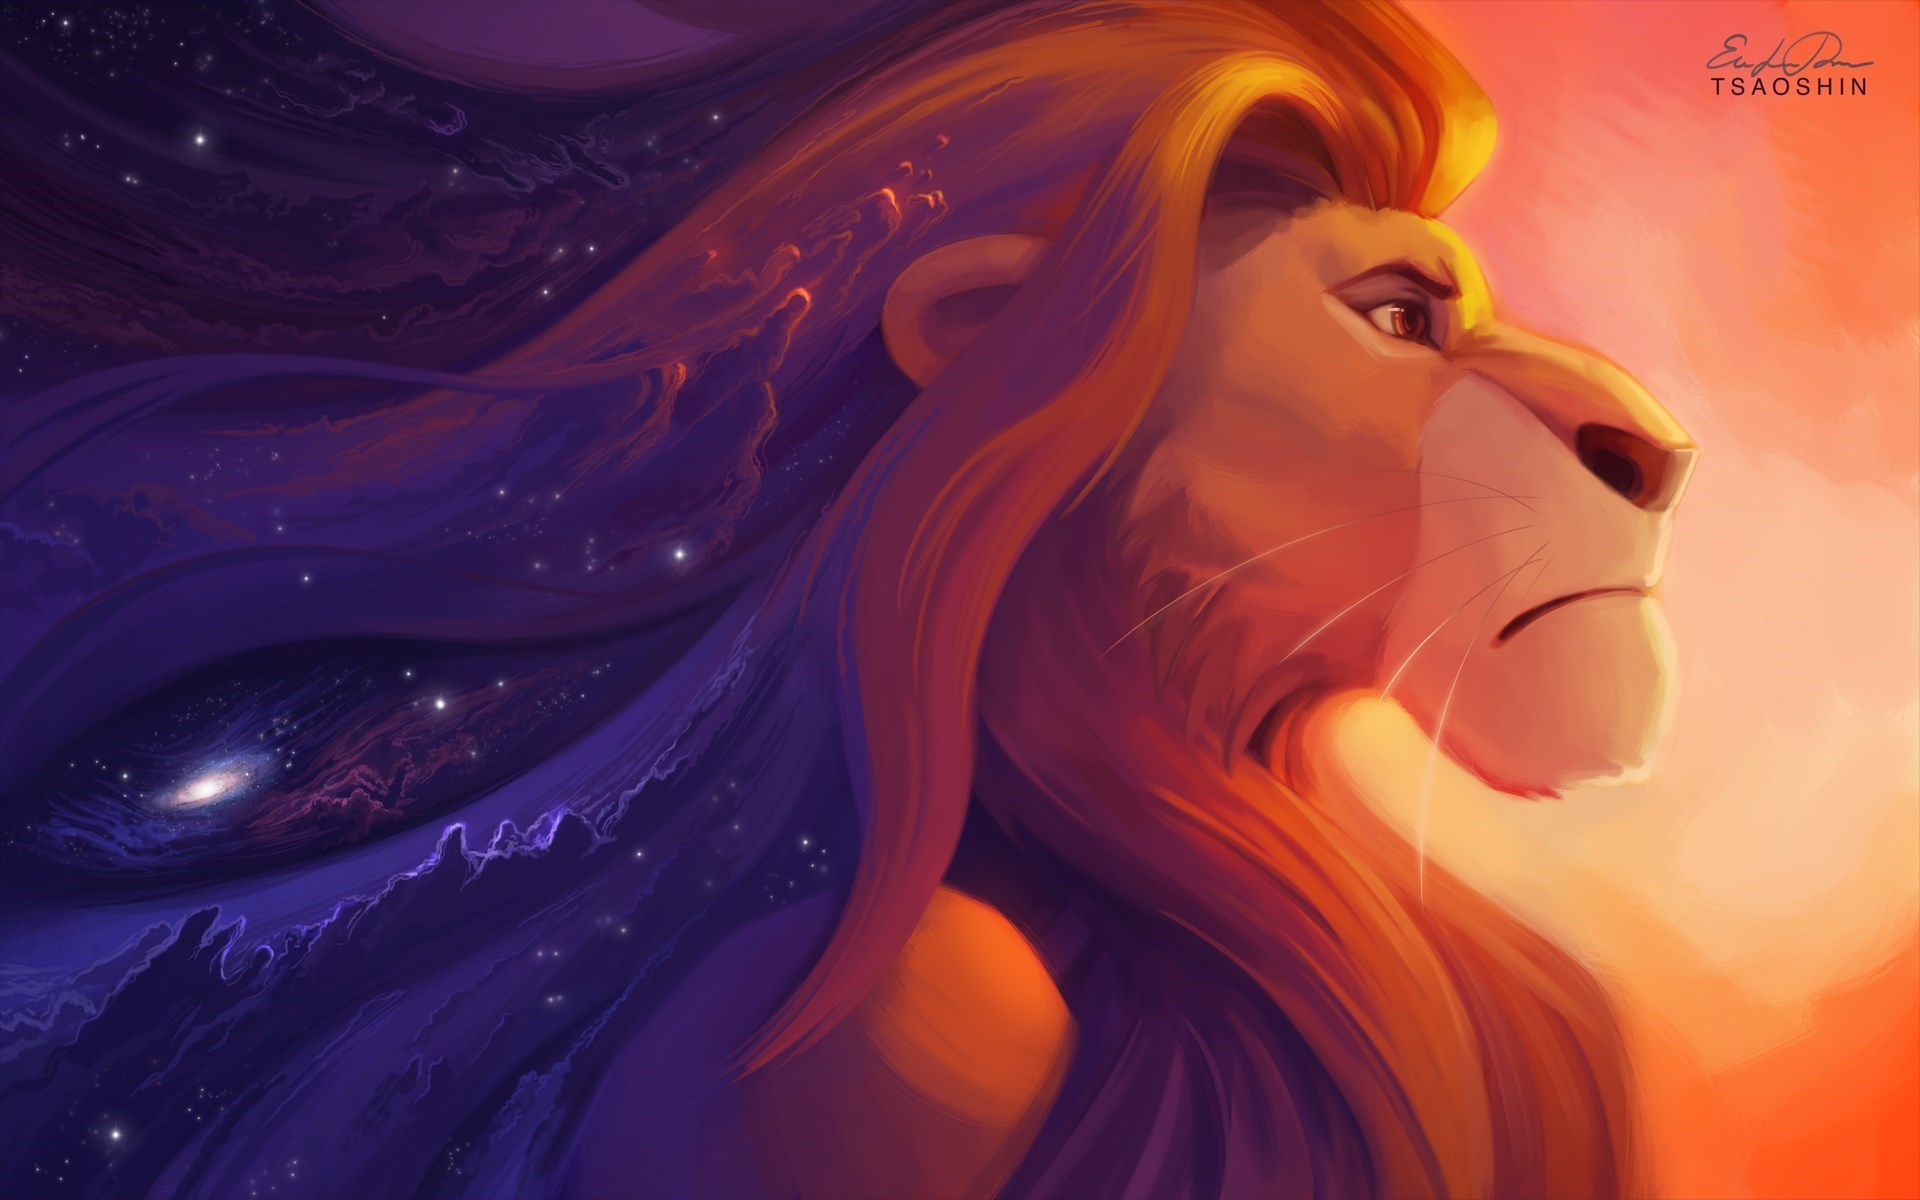 The Lion King Simba Art Cartoon HD Wallpaper